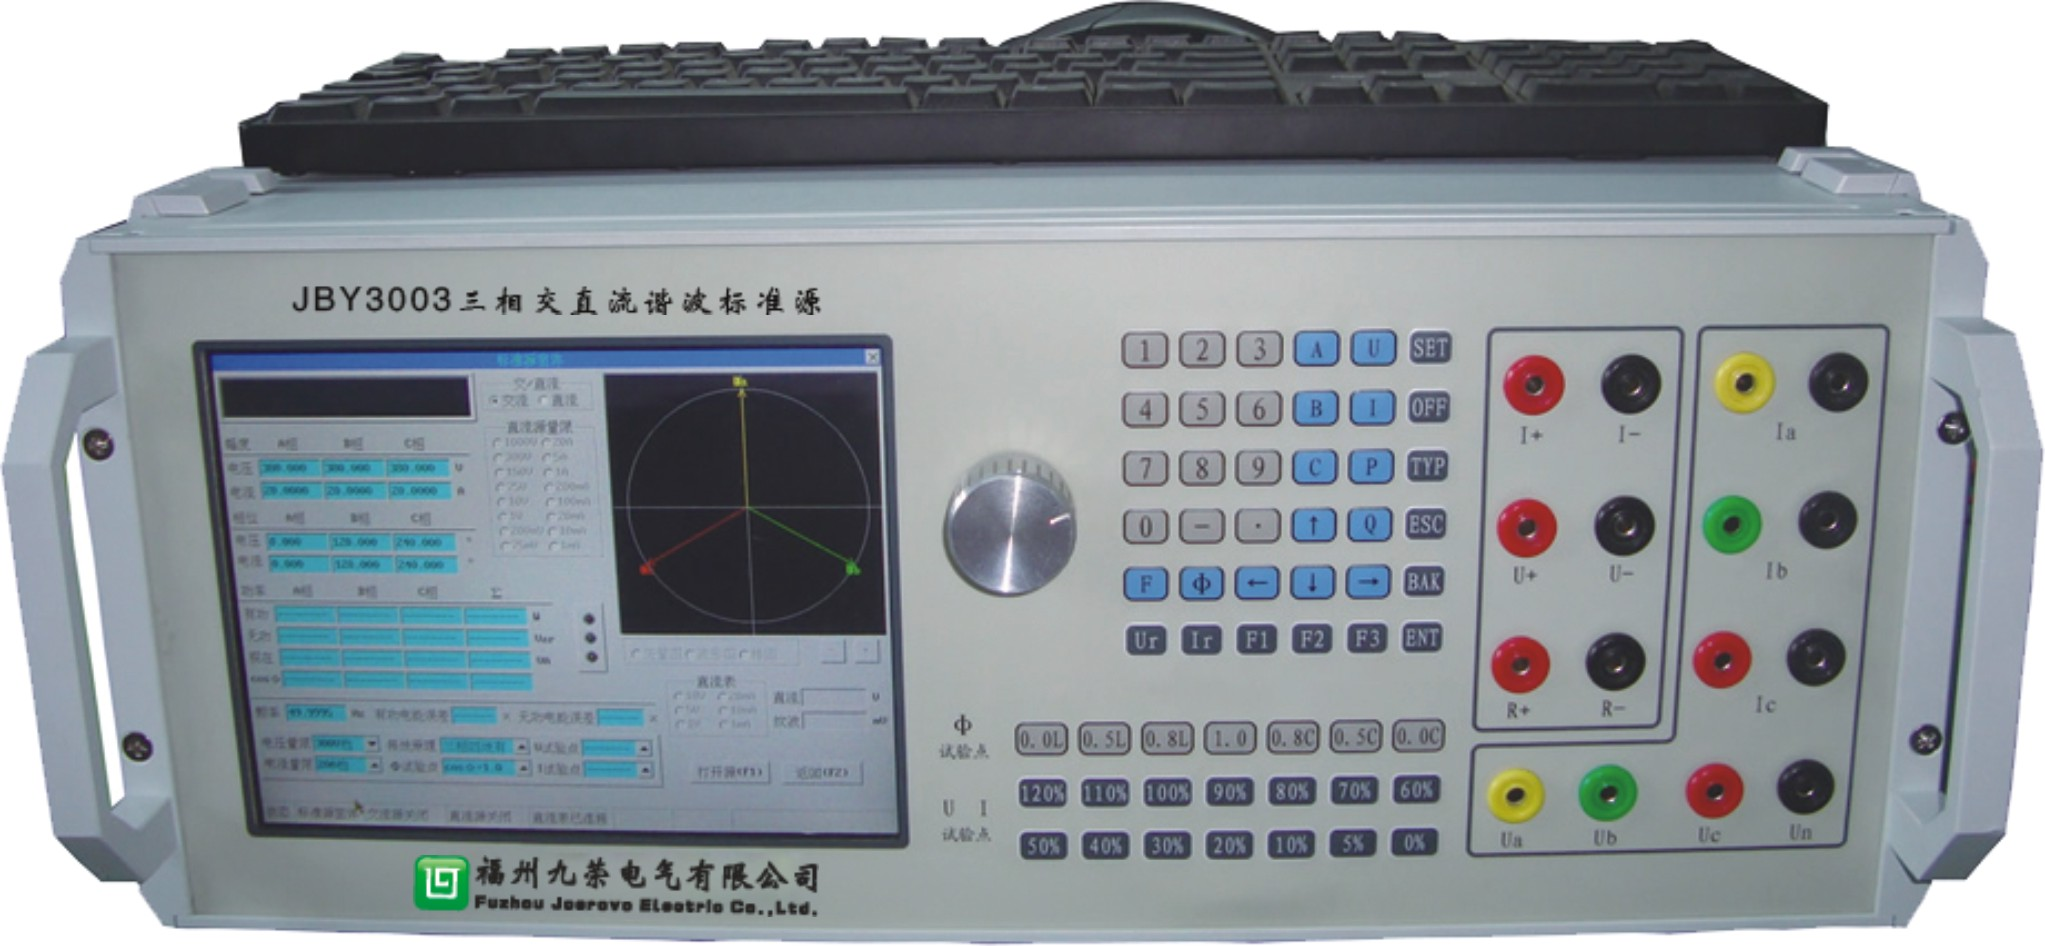 JBY3003三相交直流谐波标准源